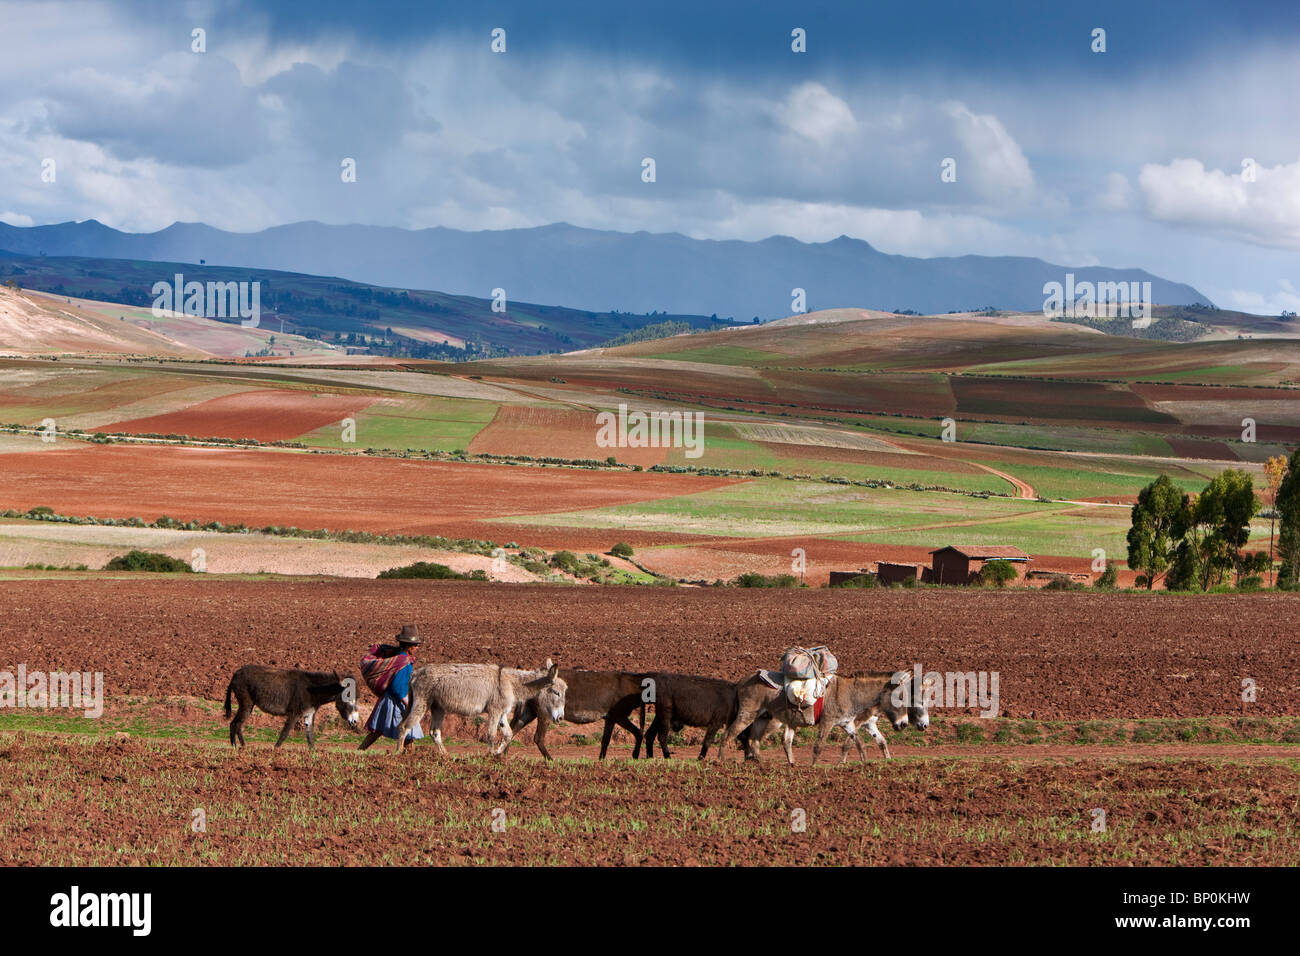 Perú, fértil país agrícola de gran altitud cerca de Maras. Imagen De Stock